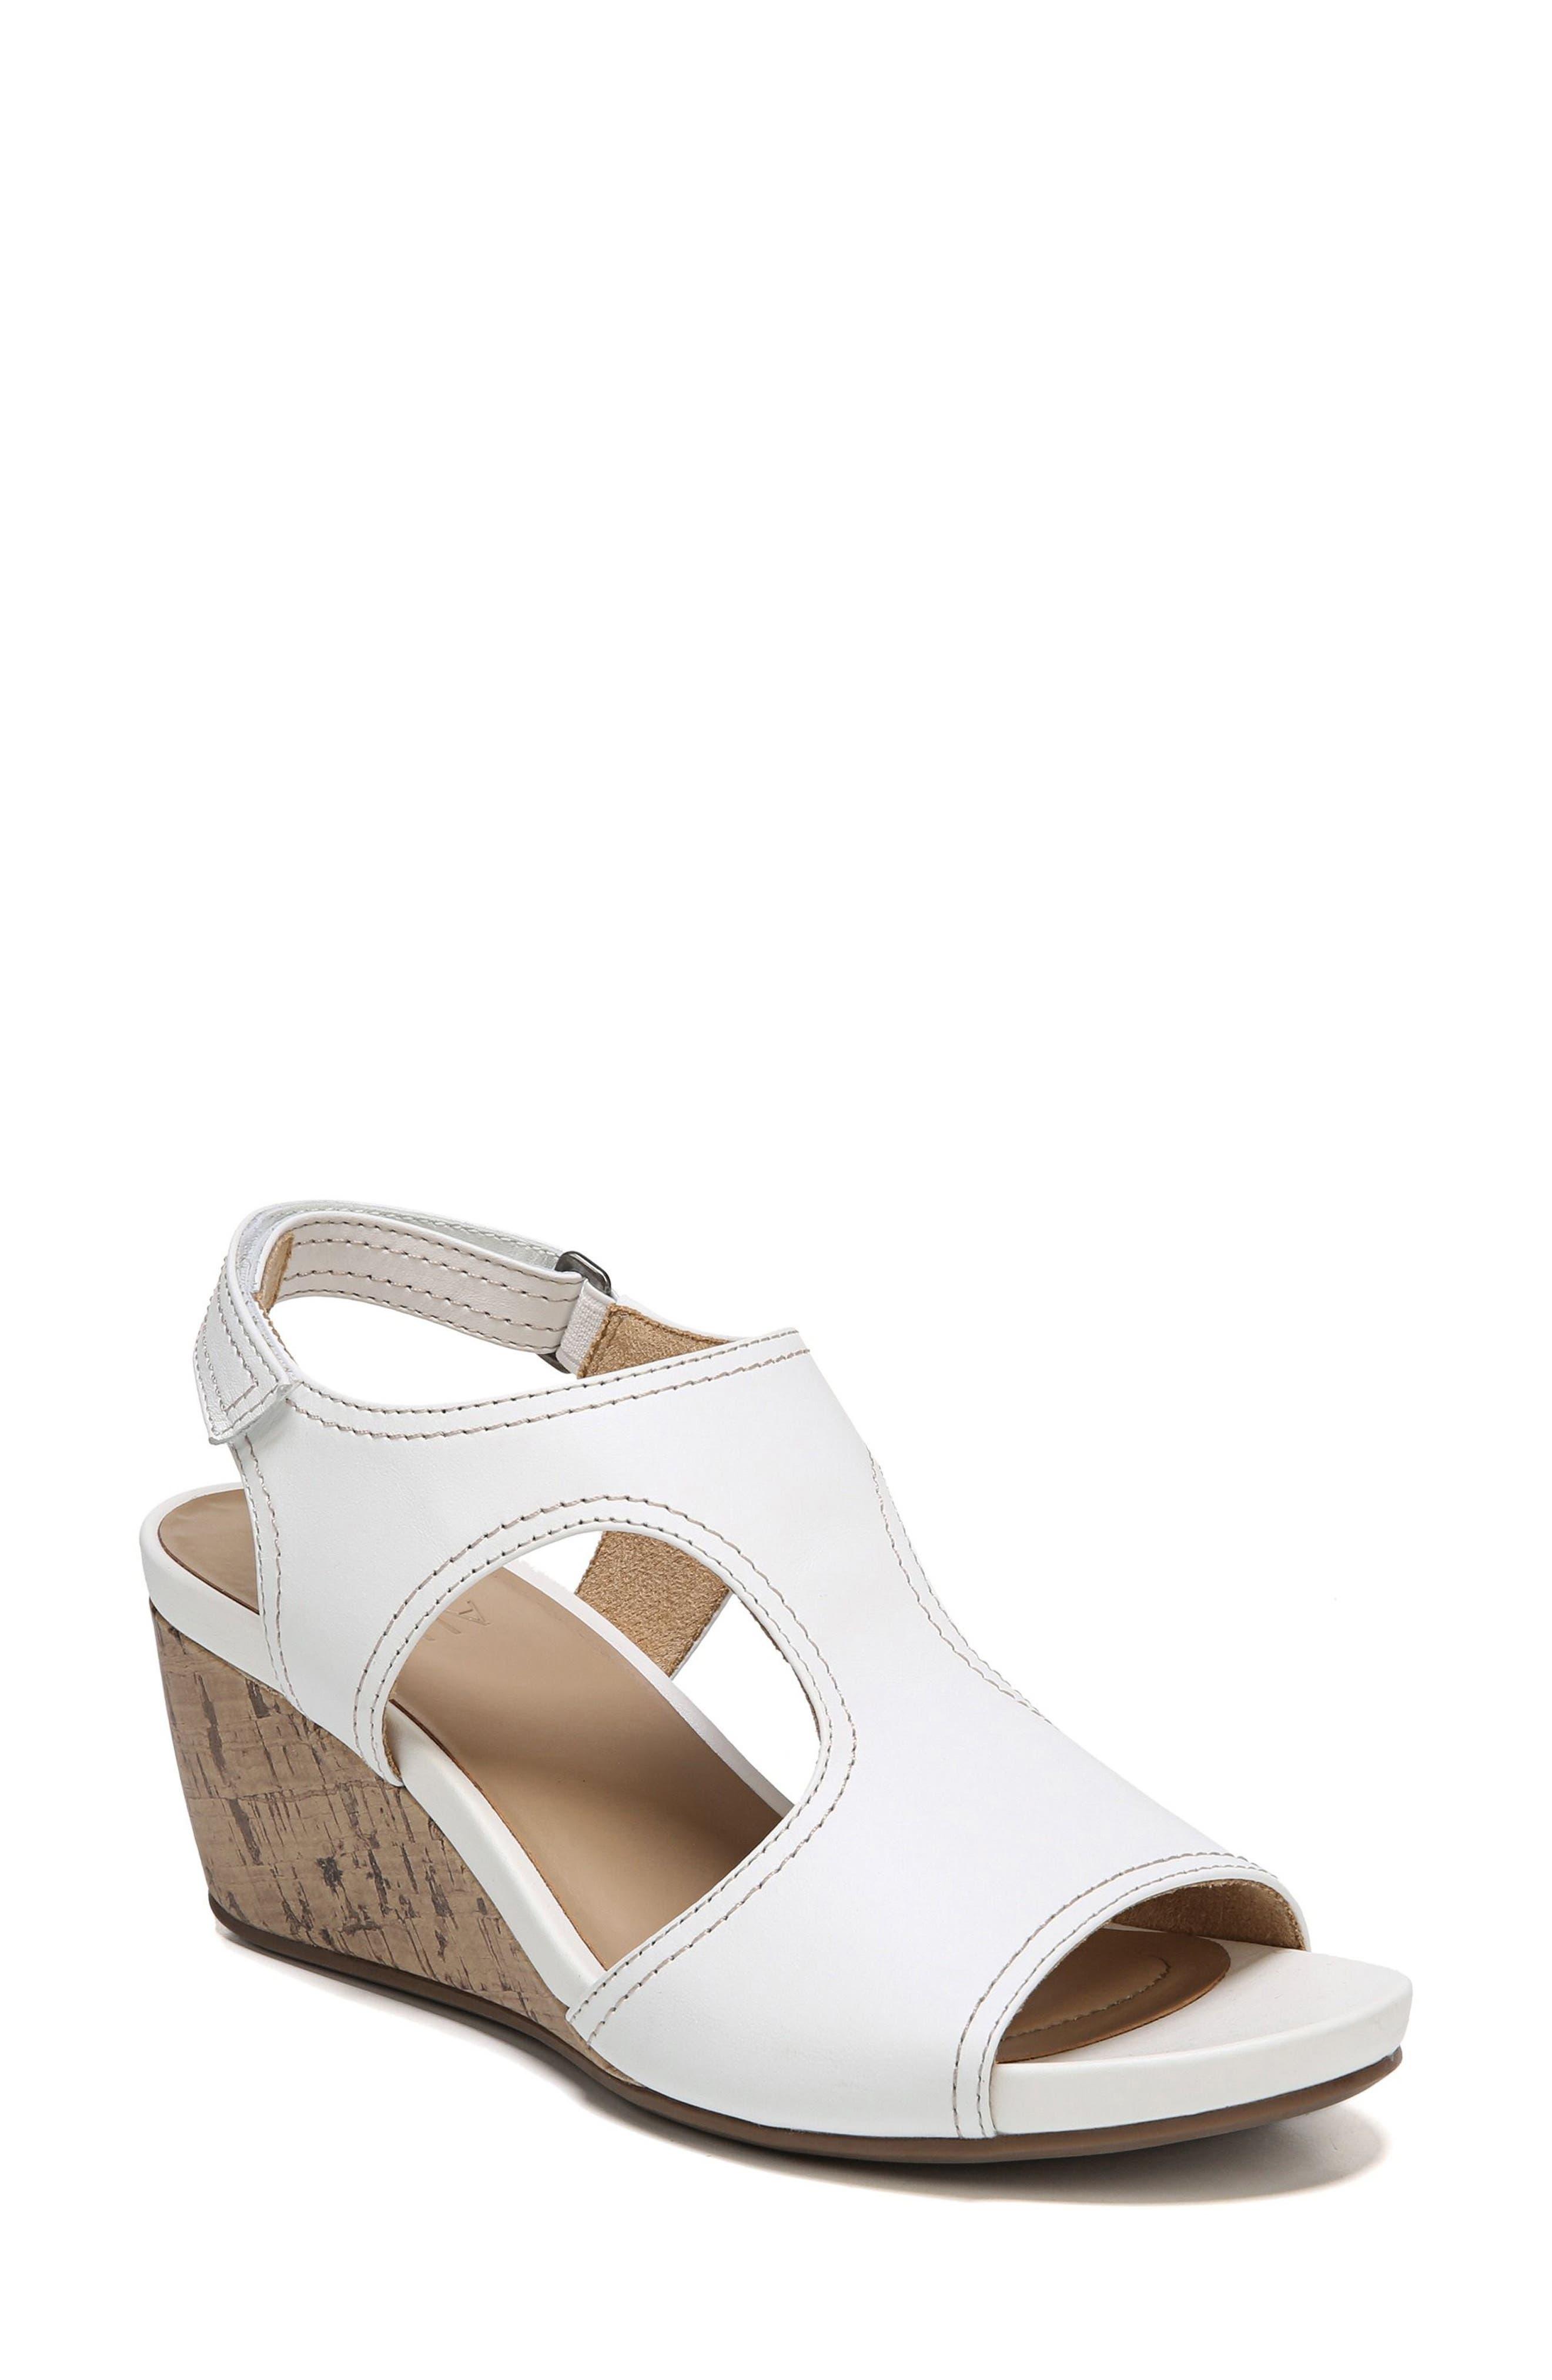 Cinda Wedge Sandal,                         Main,                         color, White Leather